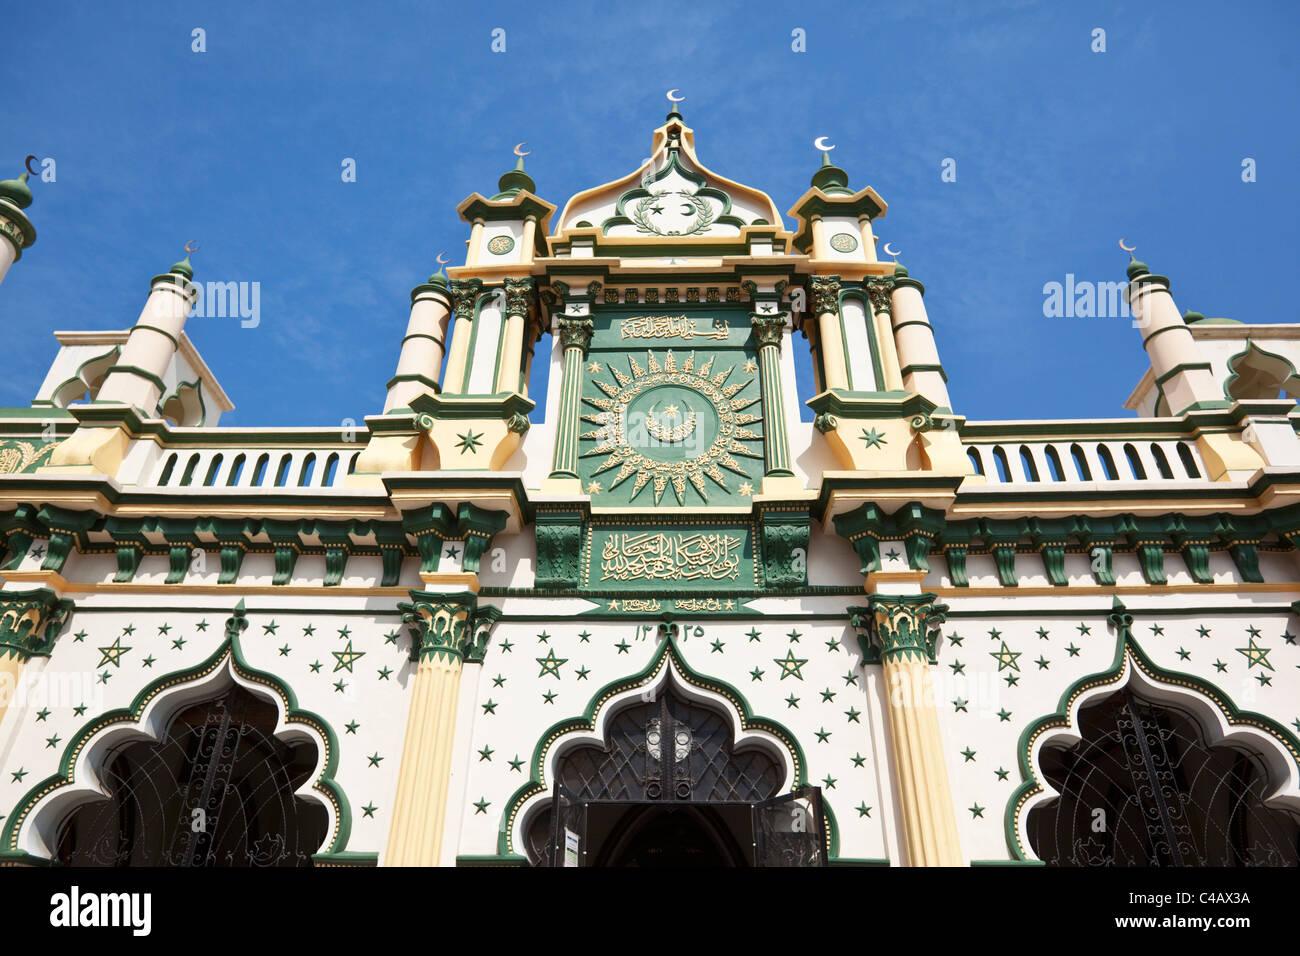 Singapore, Singapore, Little India. Architettura islamica di Abdul Gaffoor moschea. Immagini Stock